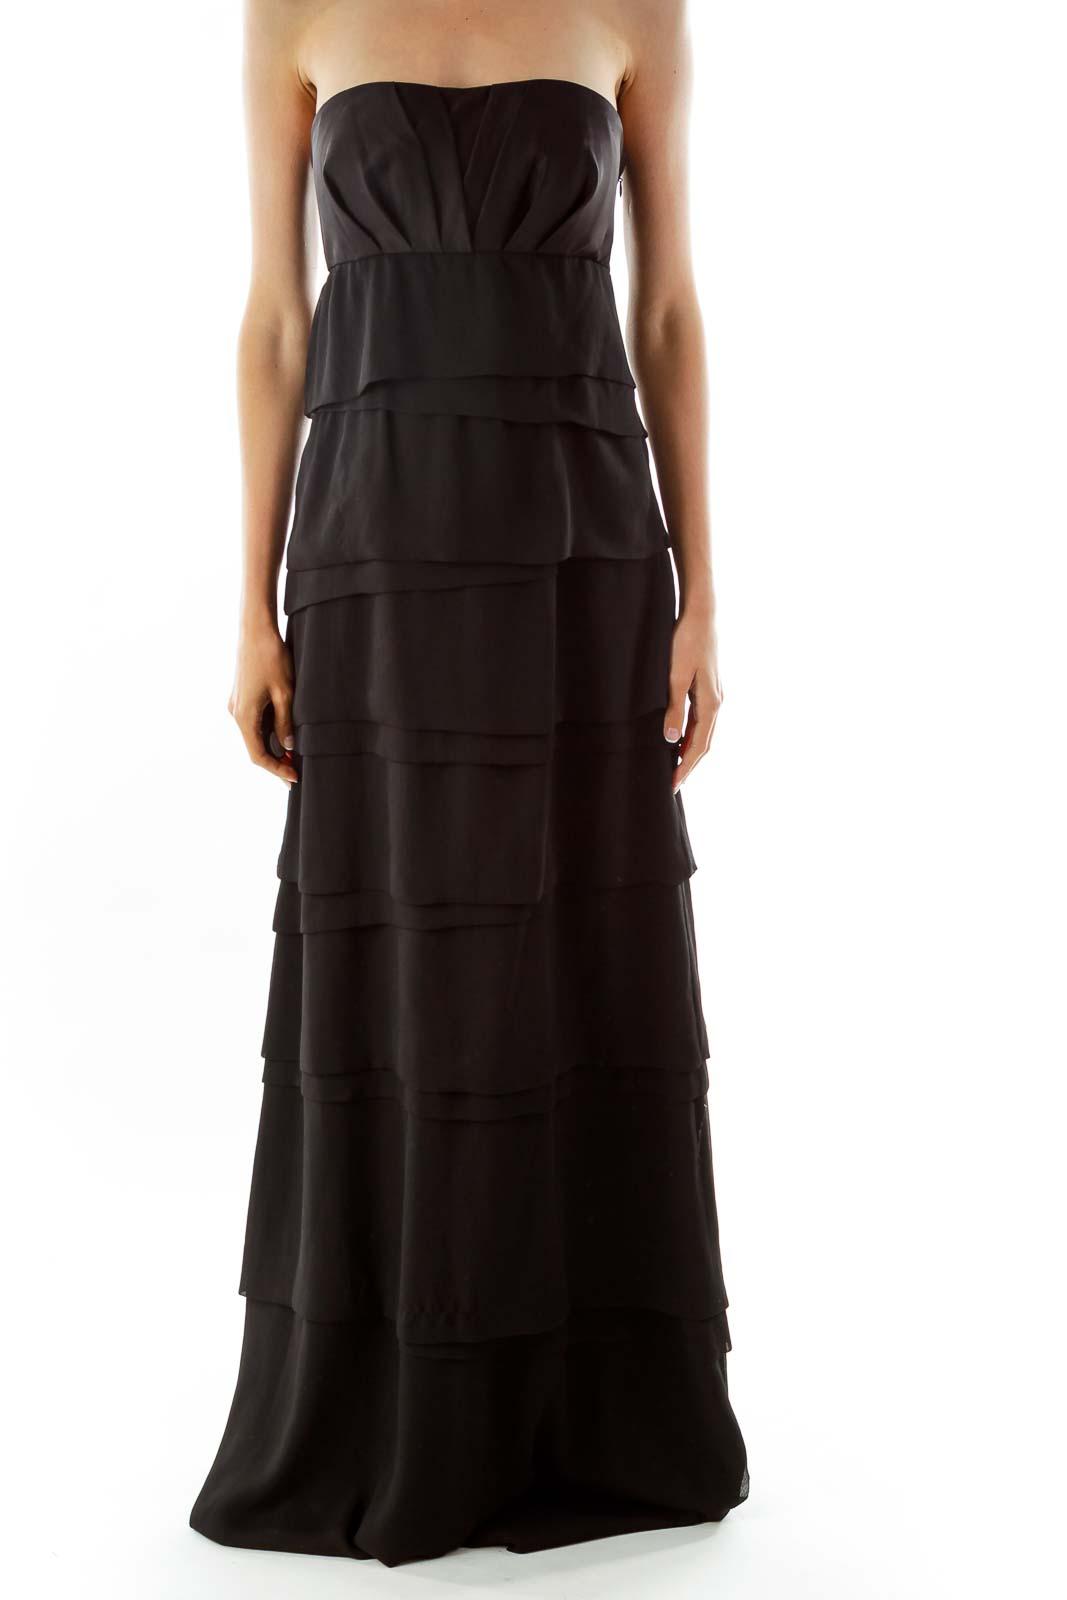 Black Ruffled Evening Dress Front